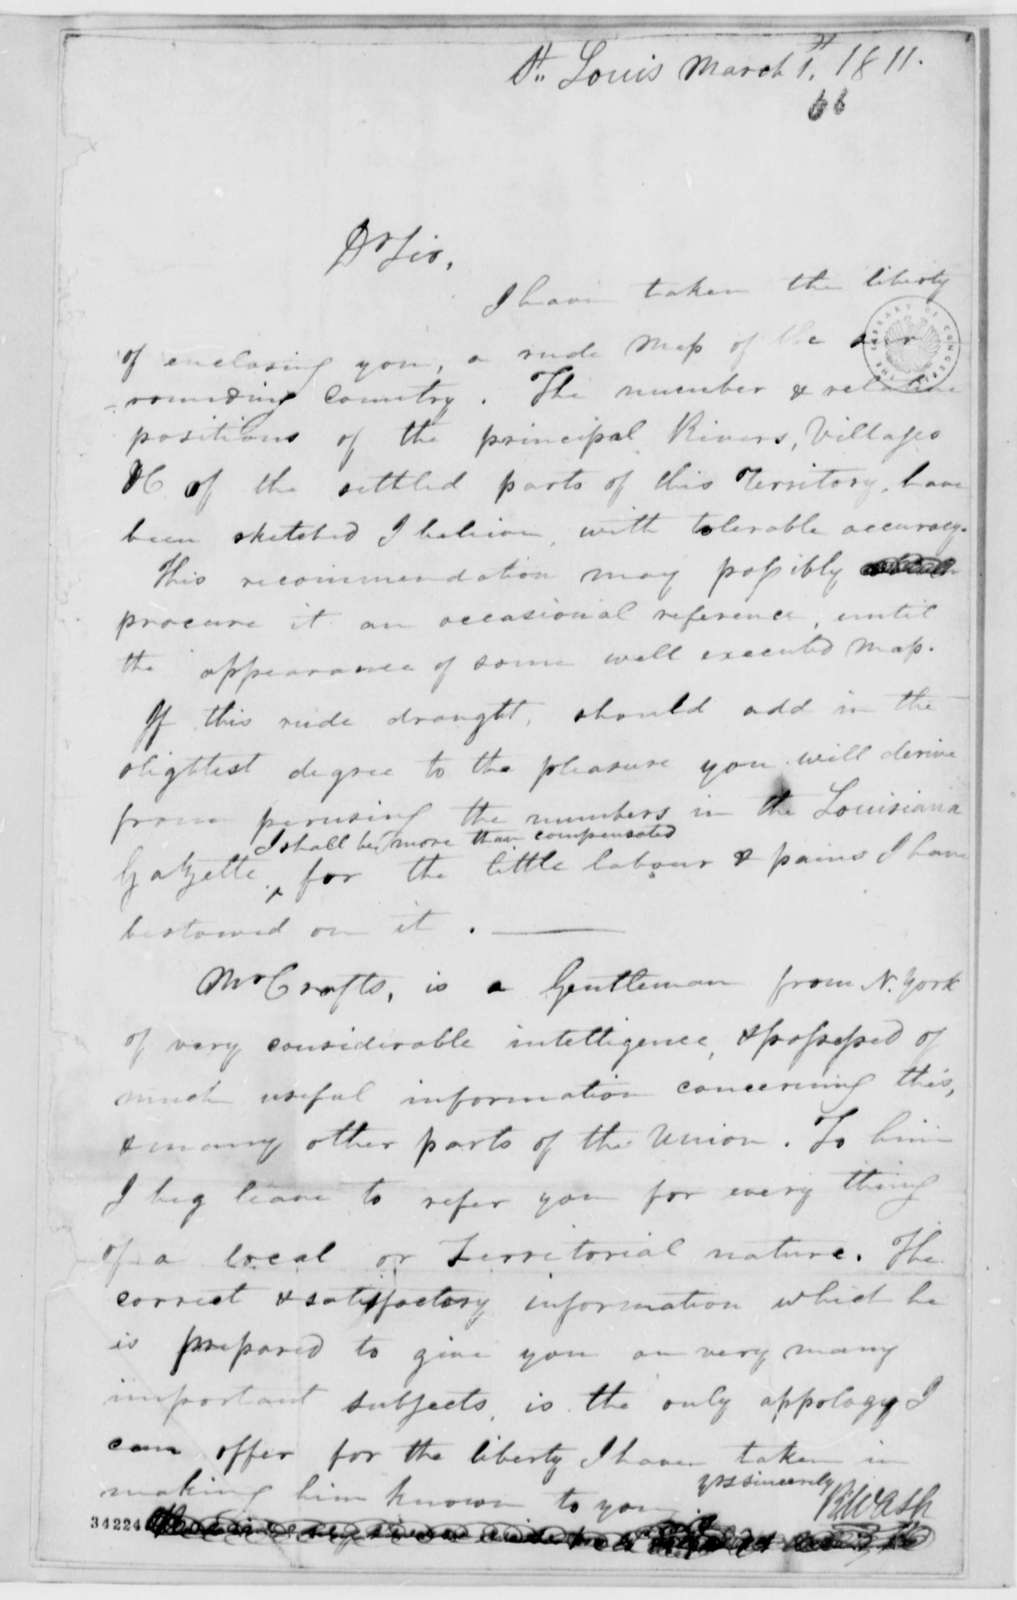 Robart Wash to Thomas Jefferson, March 1, 1811